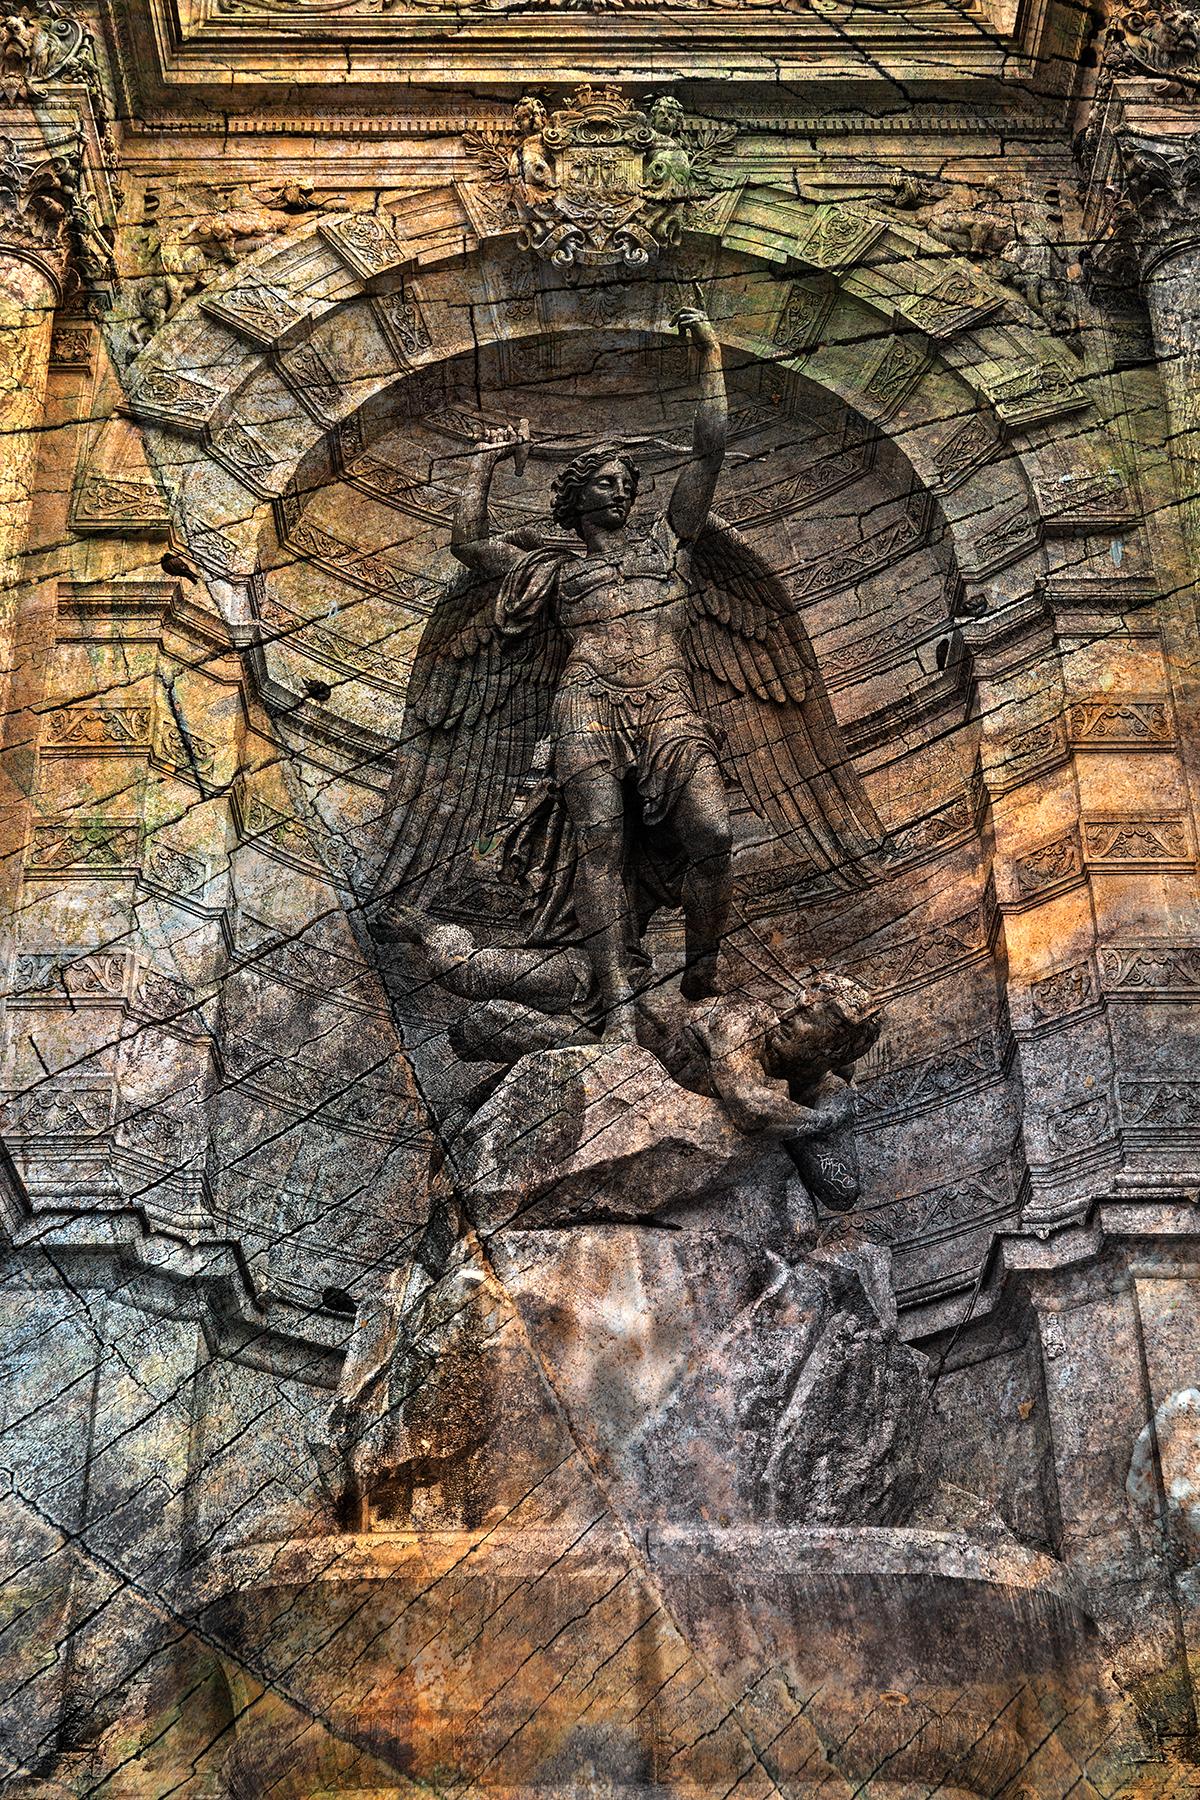 Saint-michel grunge fountain photo